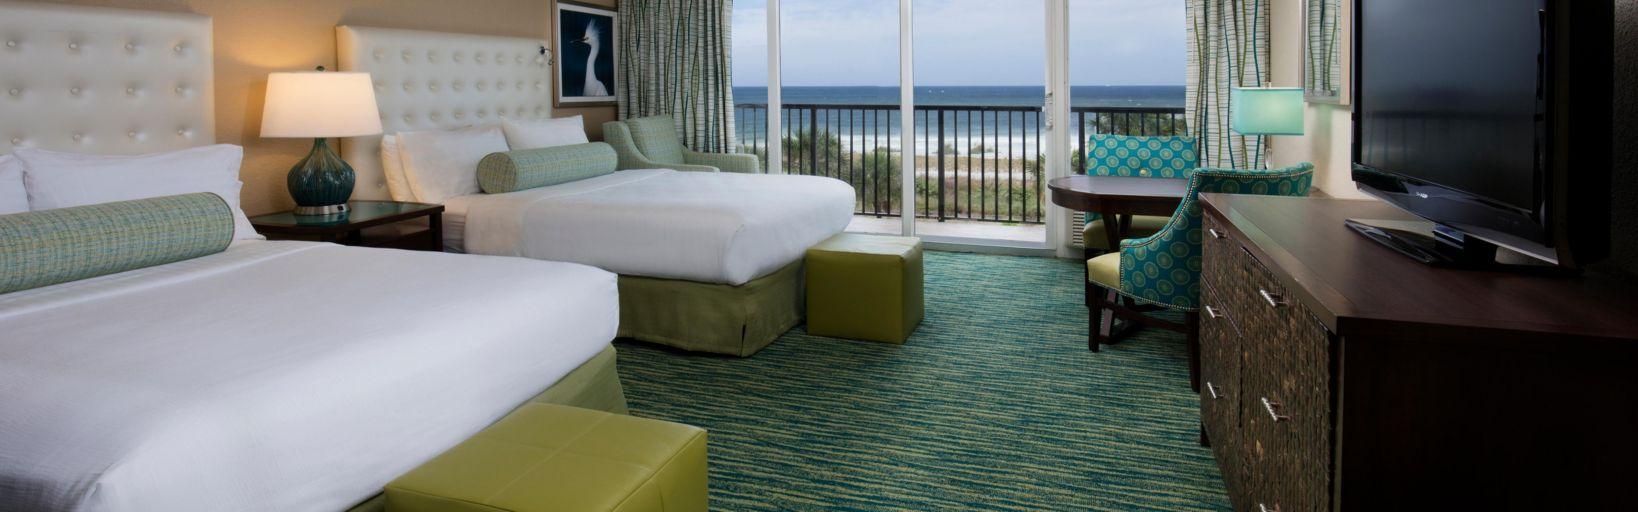 Deluxe Queen Bed Gulf View